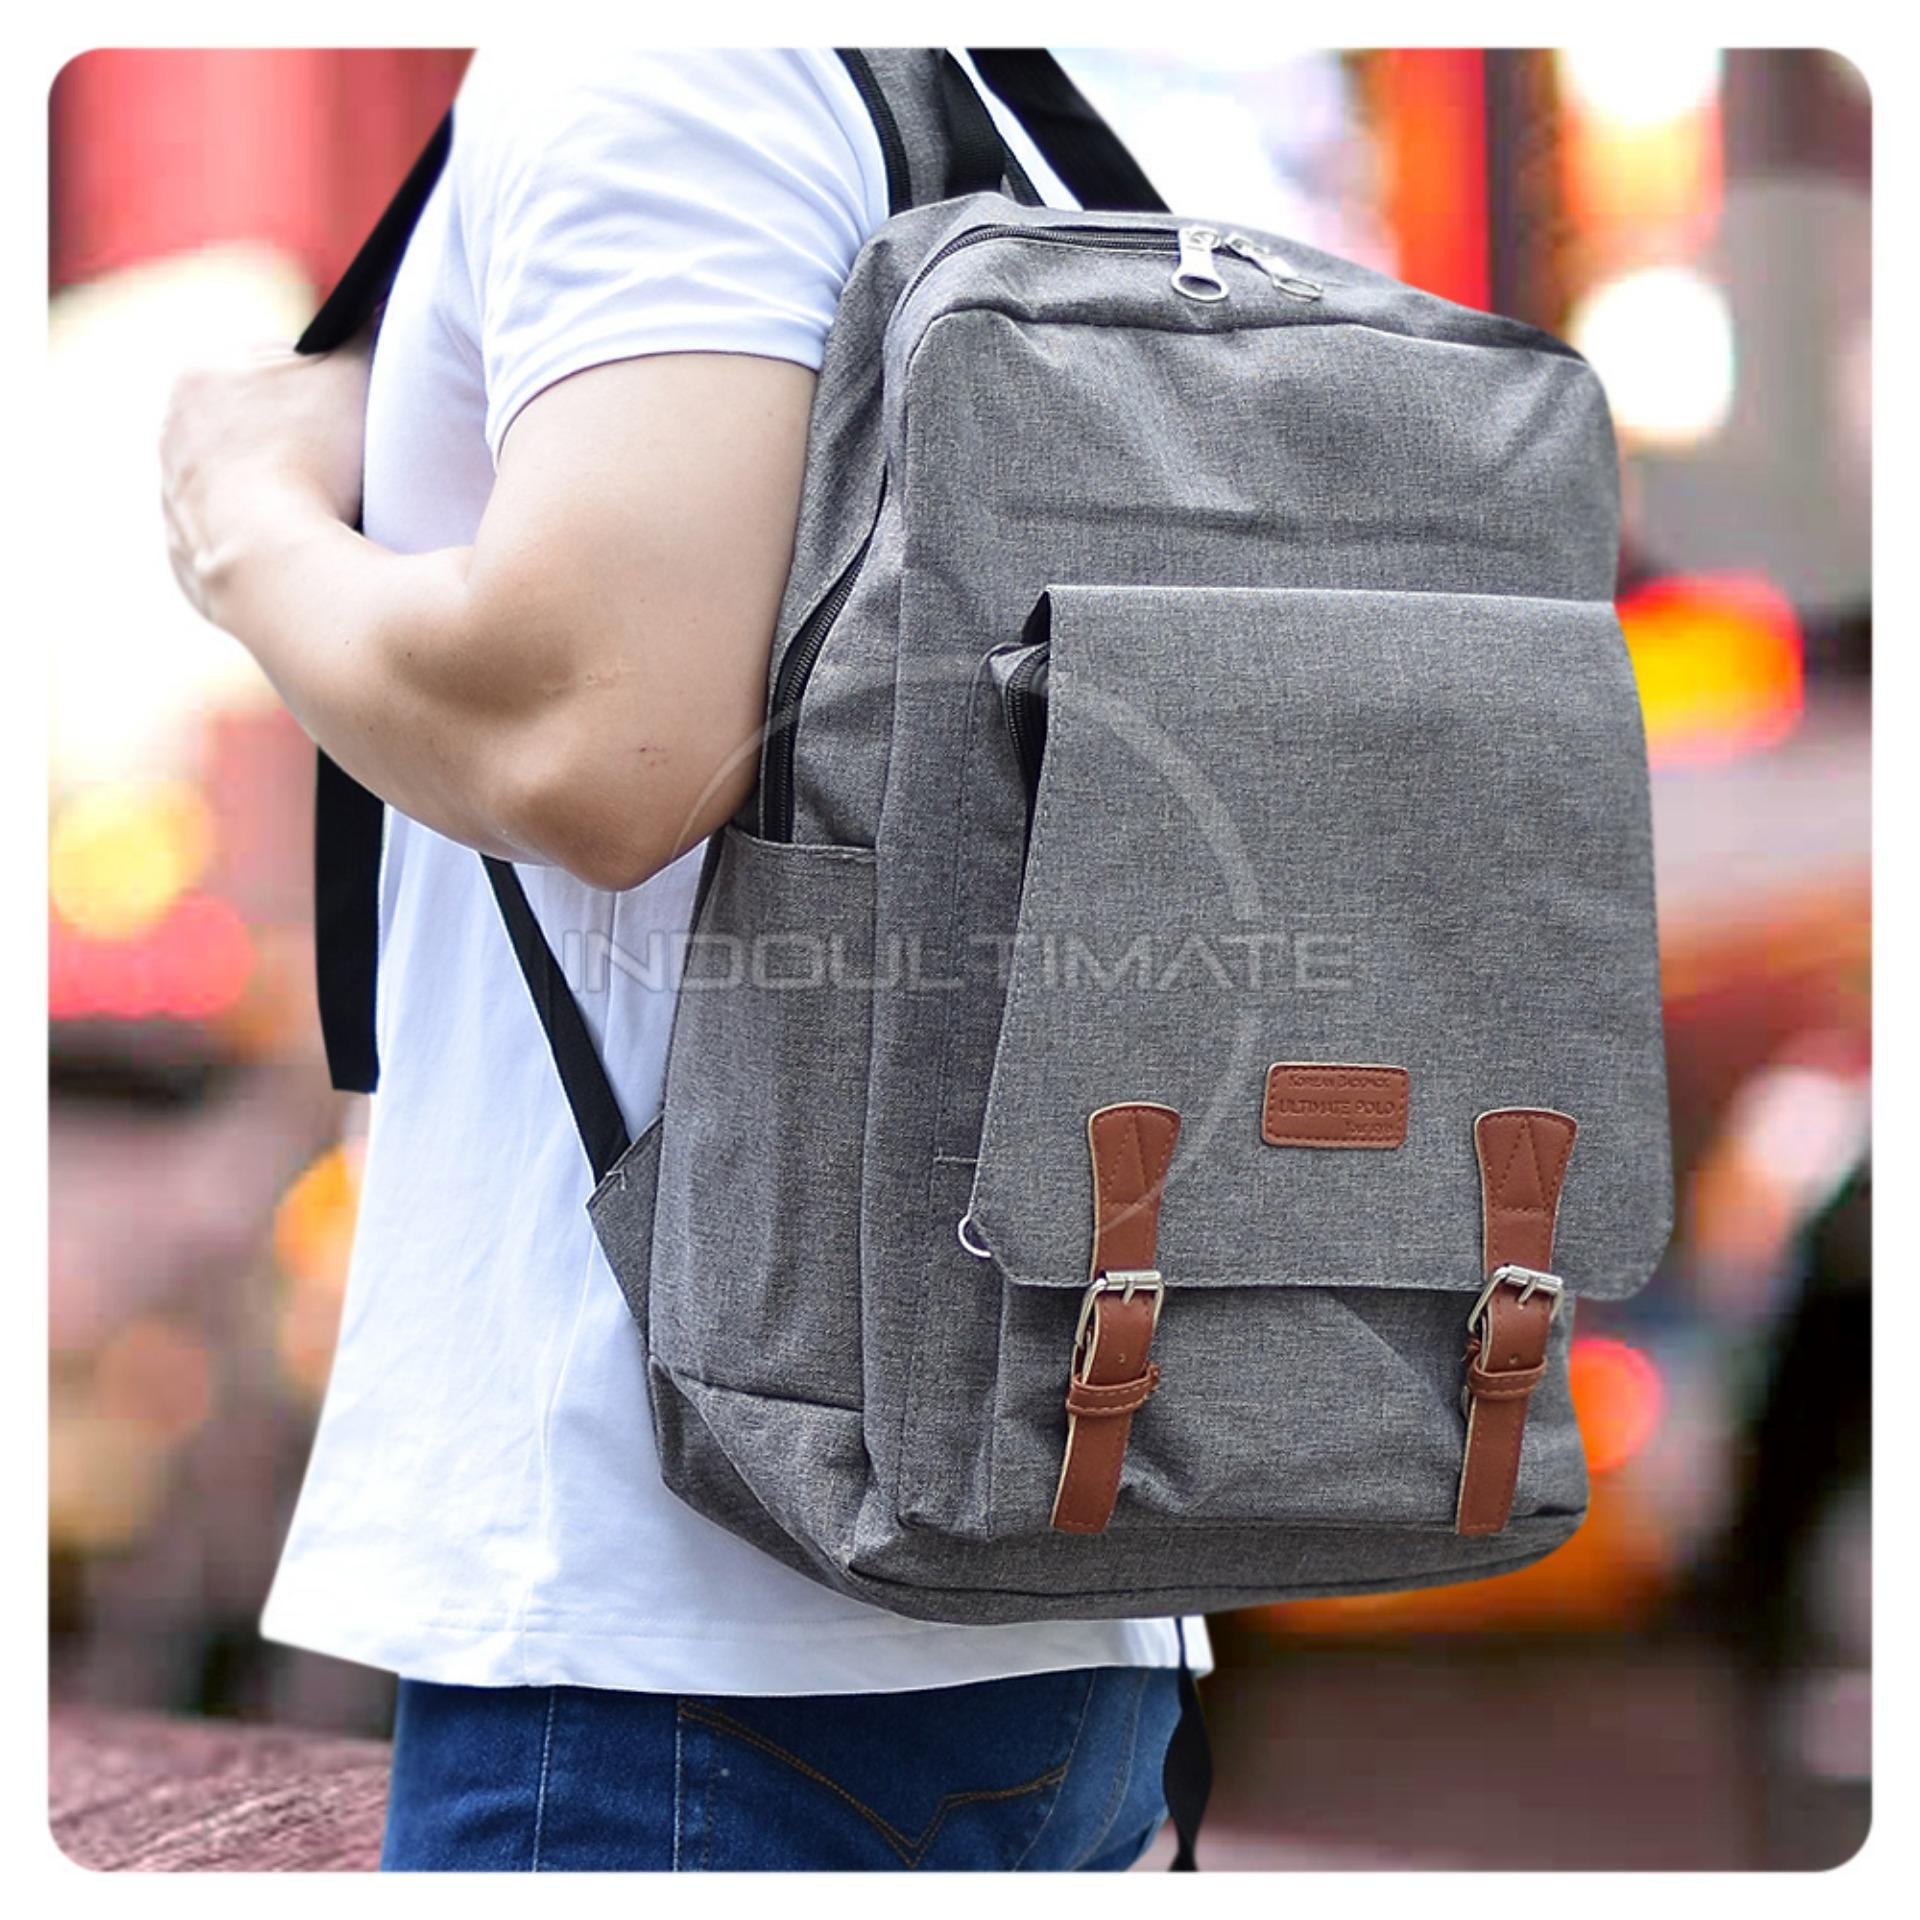 Ultimate Polo Backpack Korean Pria Wanita 853 / Tas Sekolah Anak / Tas Ransel Laptop Kanvas Kualitas Ori Import - Gray